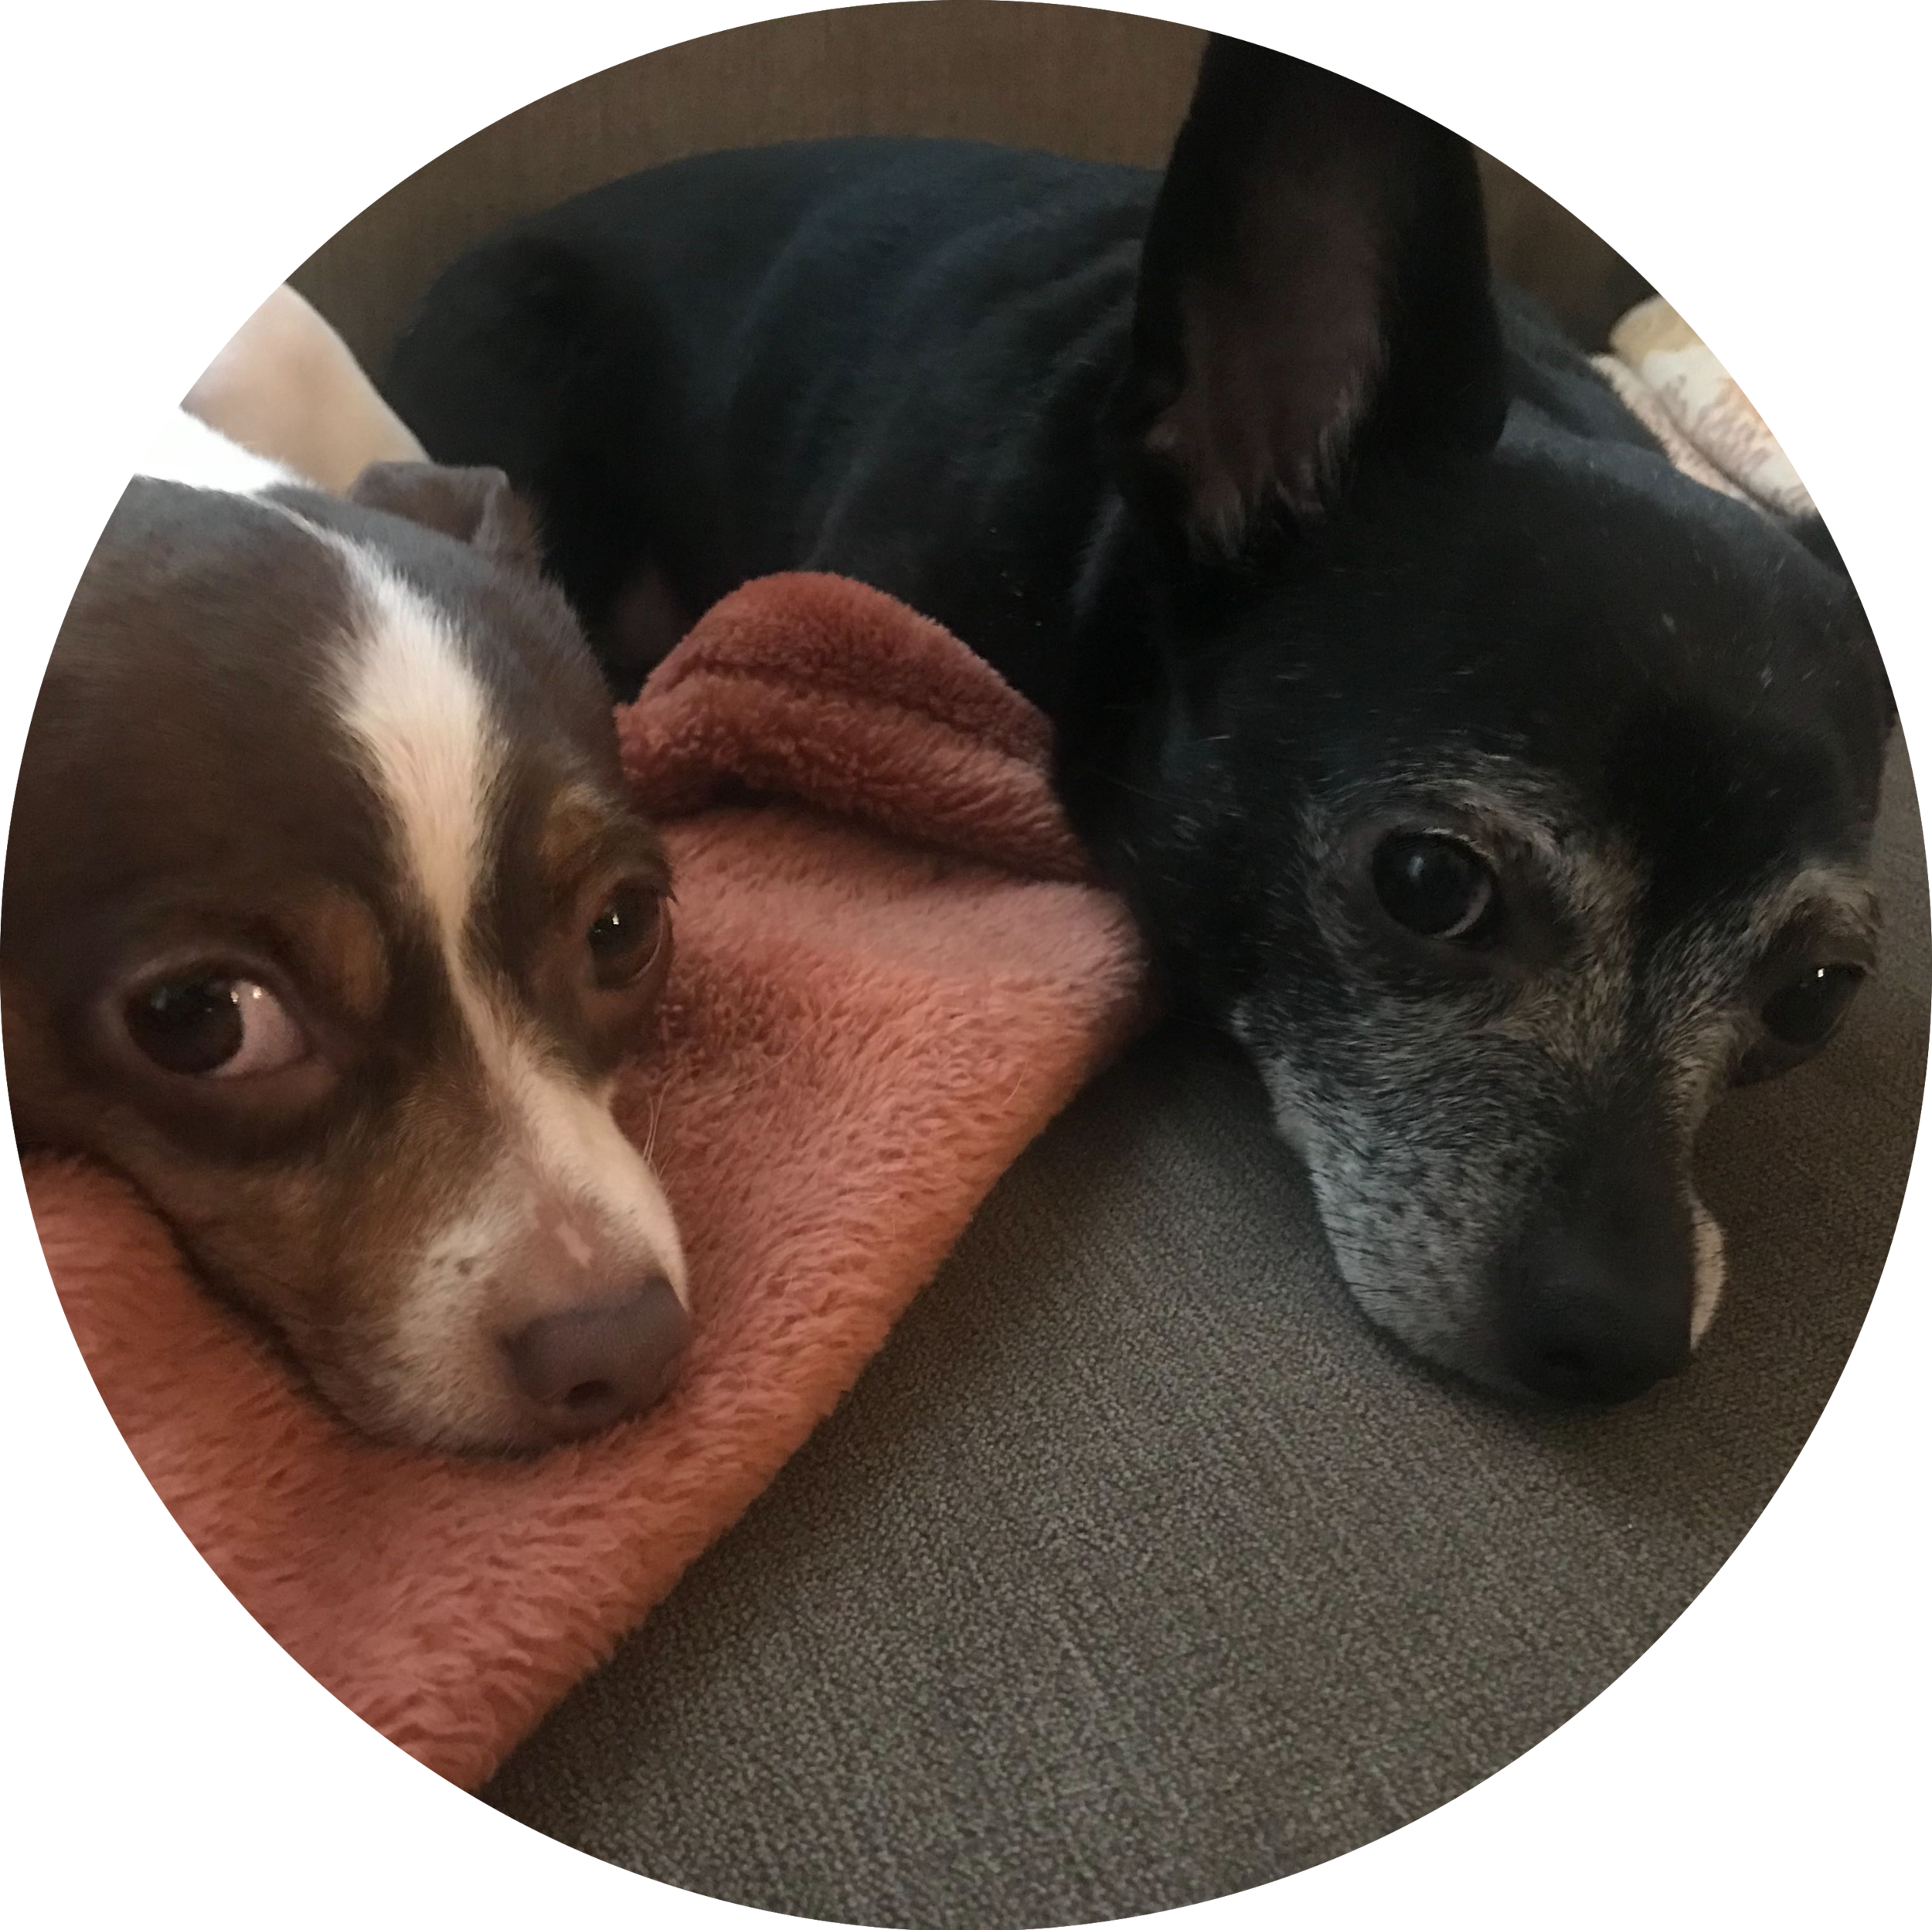 Two chihuahuas look skeptically at the camera